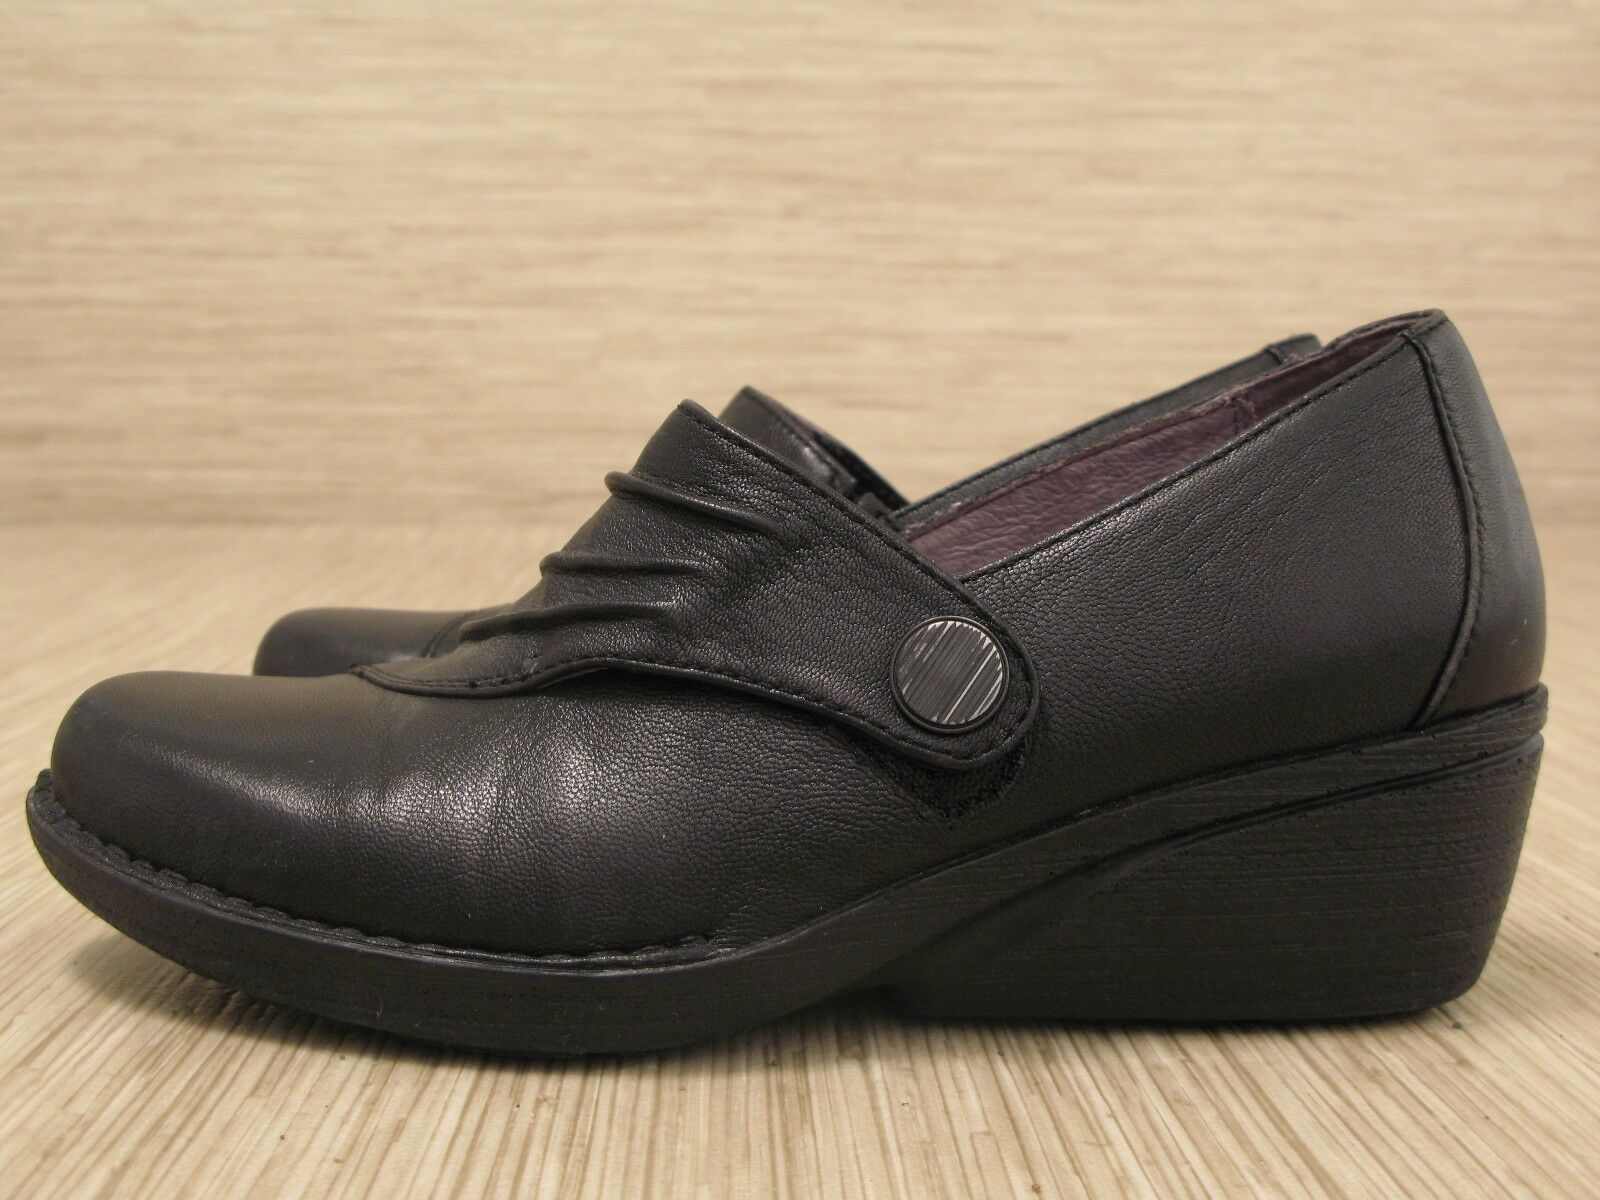 Dansko noir chaussures en cuir femme Taille Us 7-8 Eur 38 boutons Mocassins